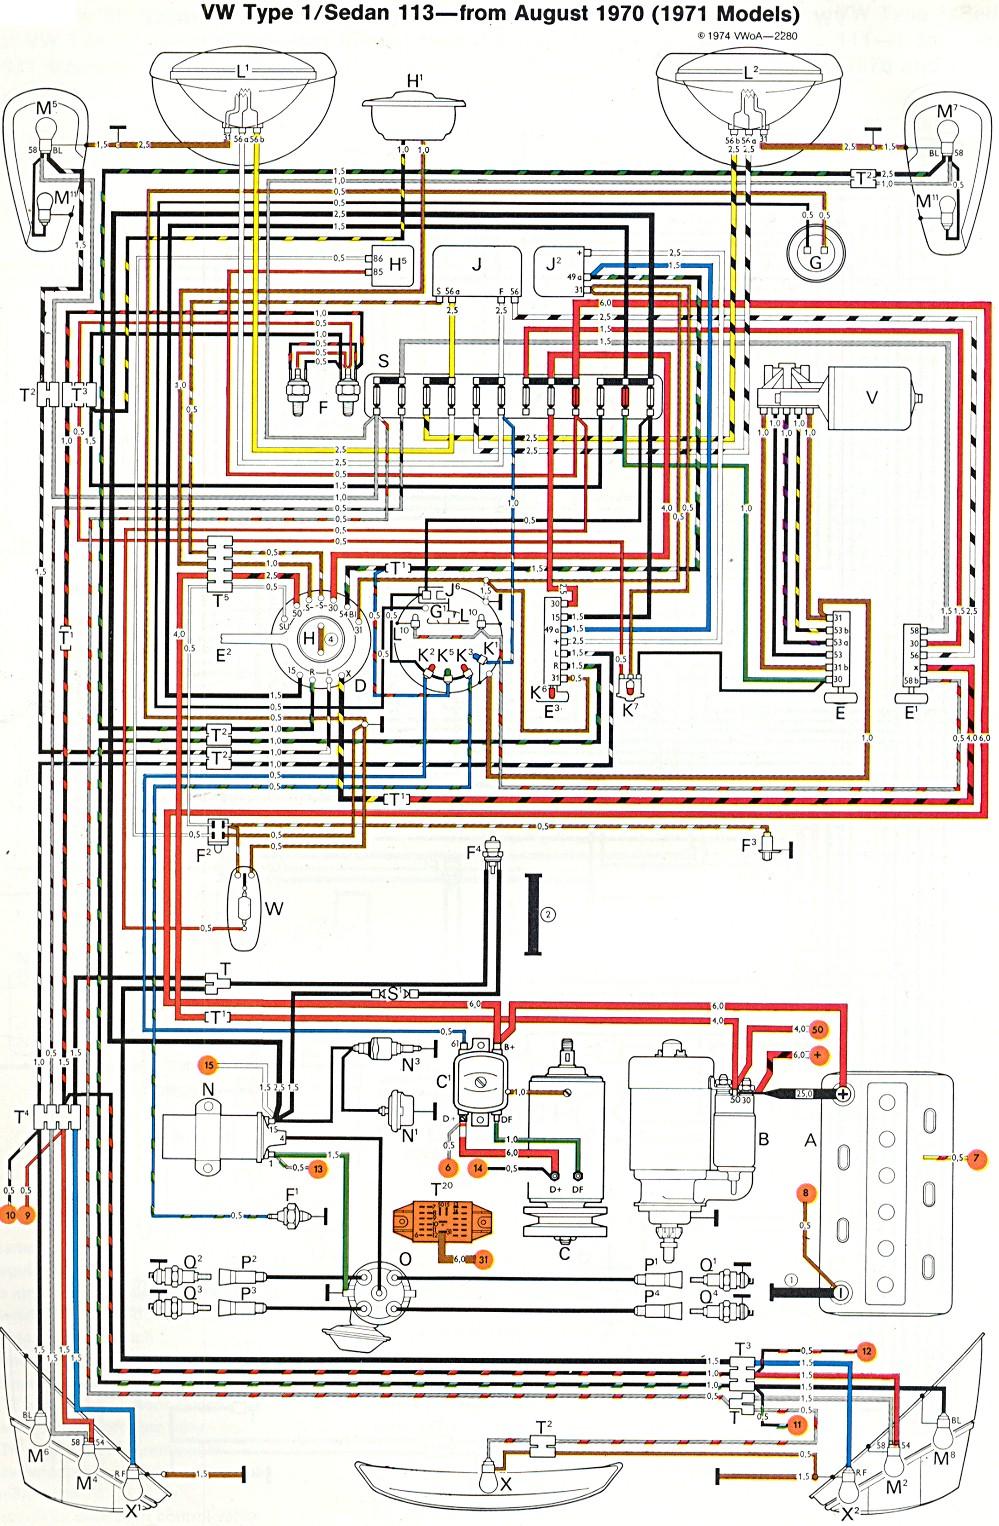 1971 Super Beetle Wiring Diagram TheGoldenBug Com